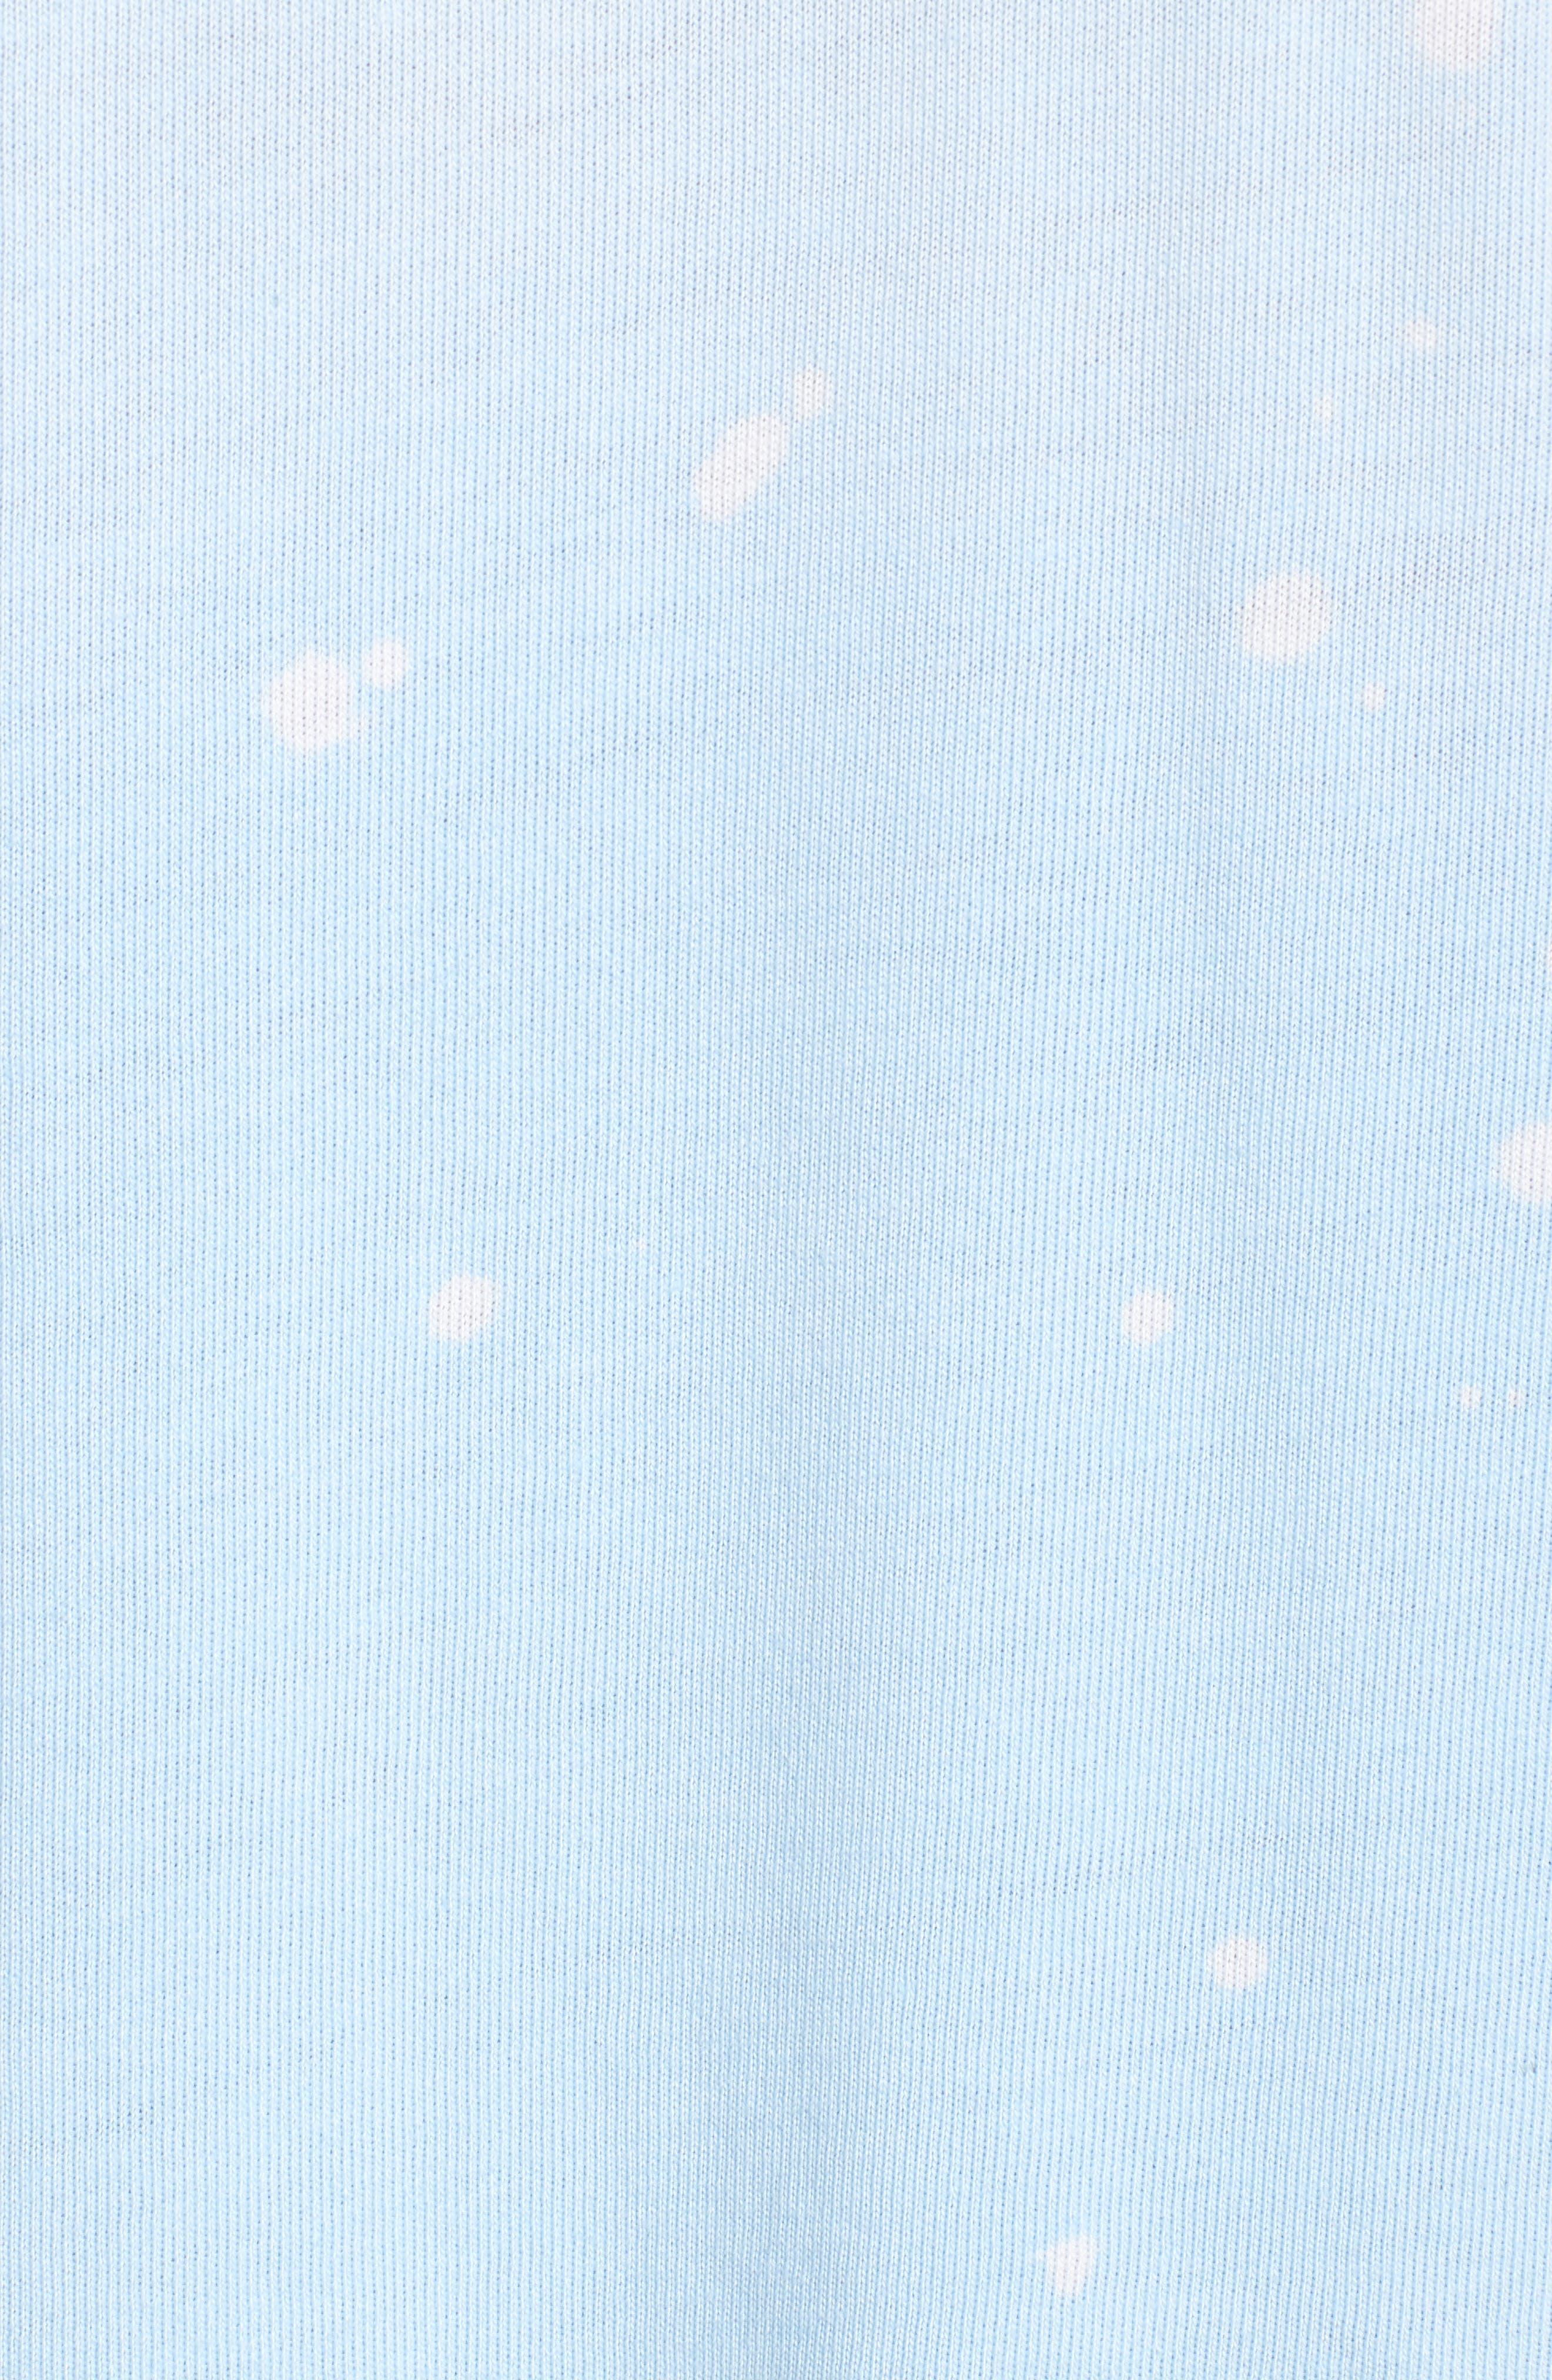 Coco Nuts Light Fleece Sweatshirt,                             Alternate thumbnail 6, color,                             SUN FADED SKY